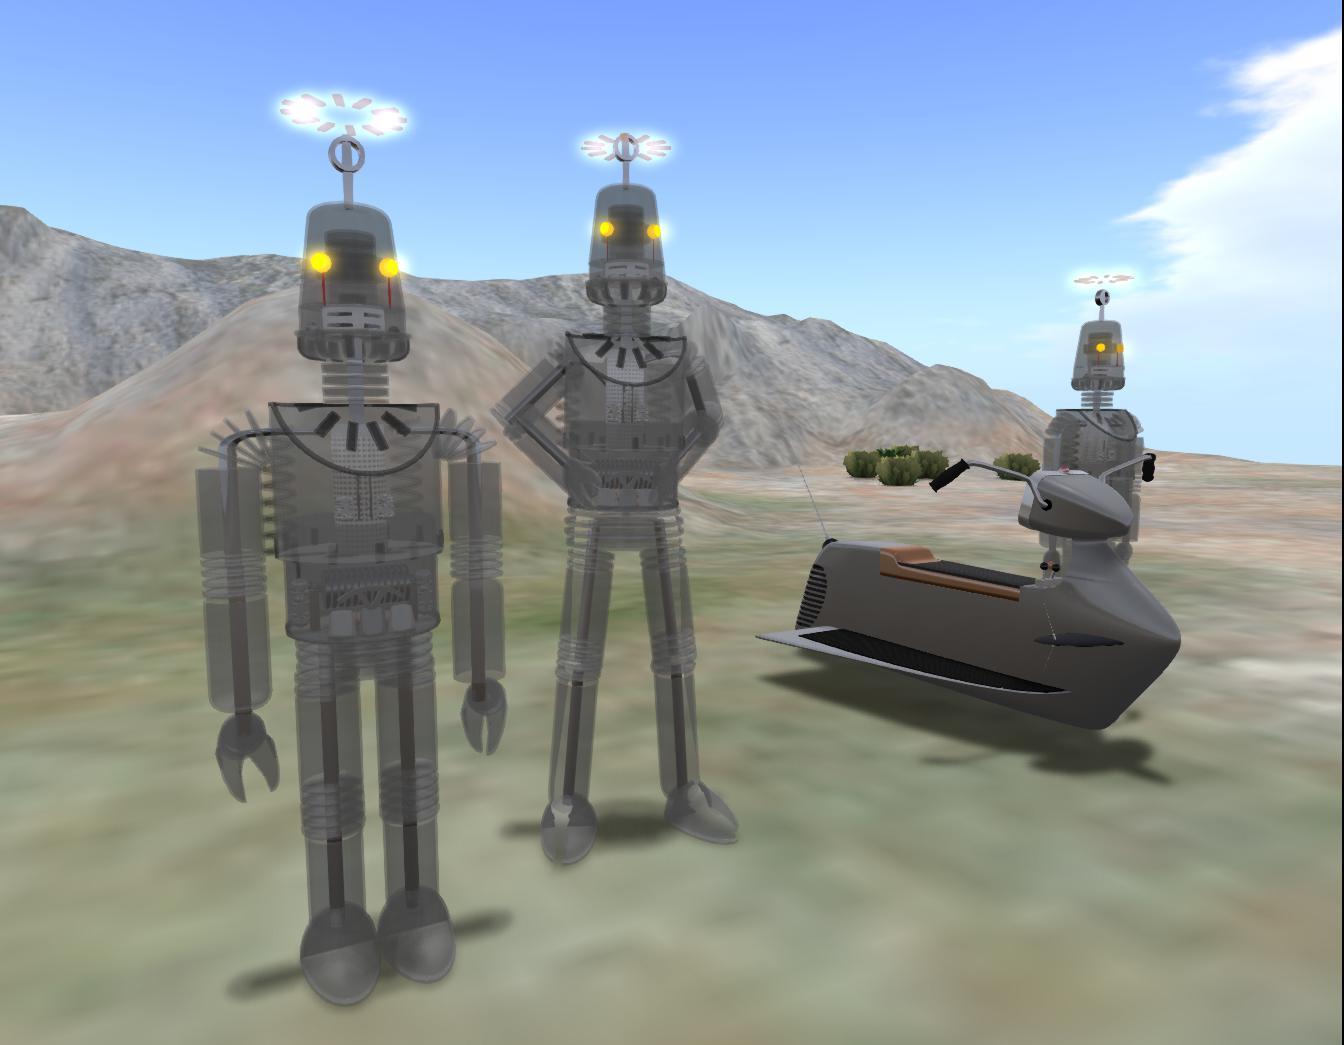 2013-10-07-Robert-the-Robot-Build-3